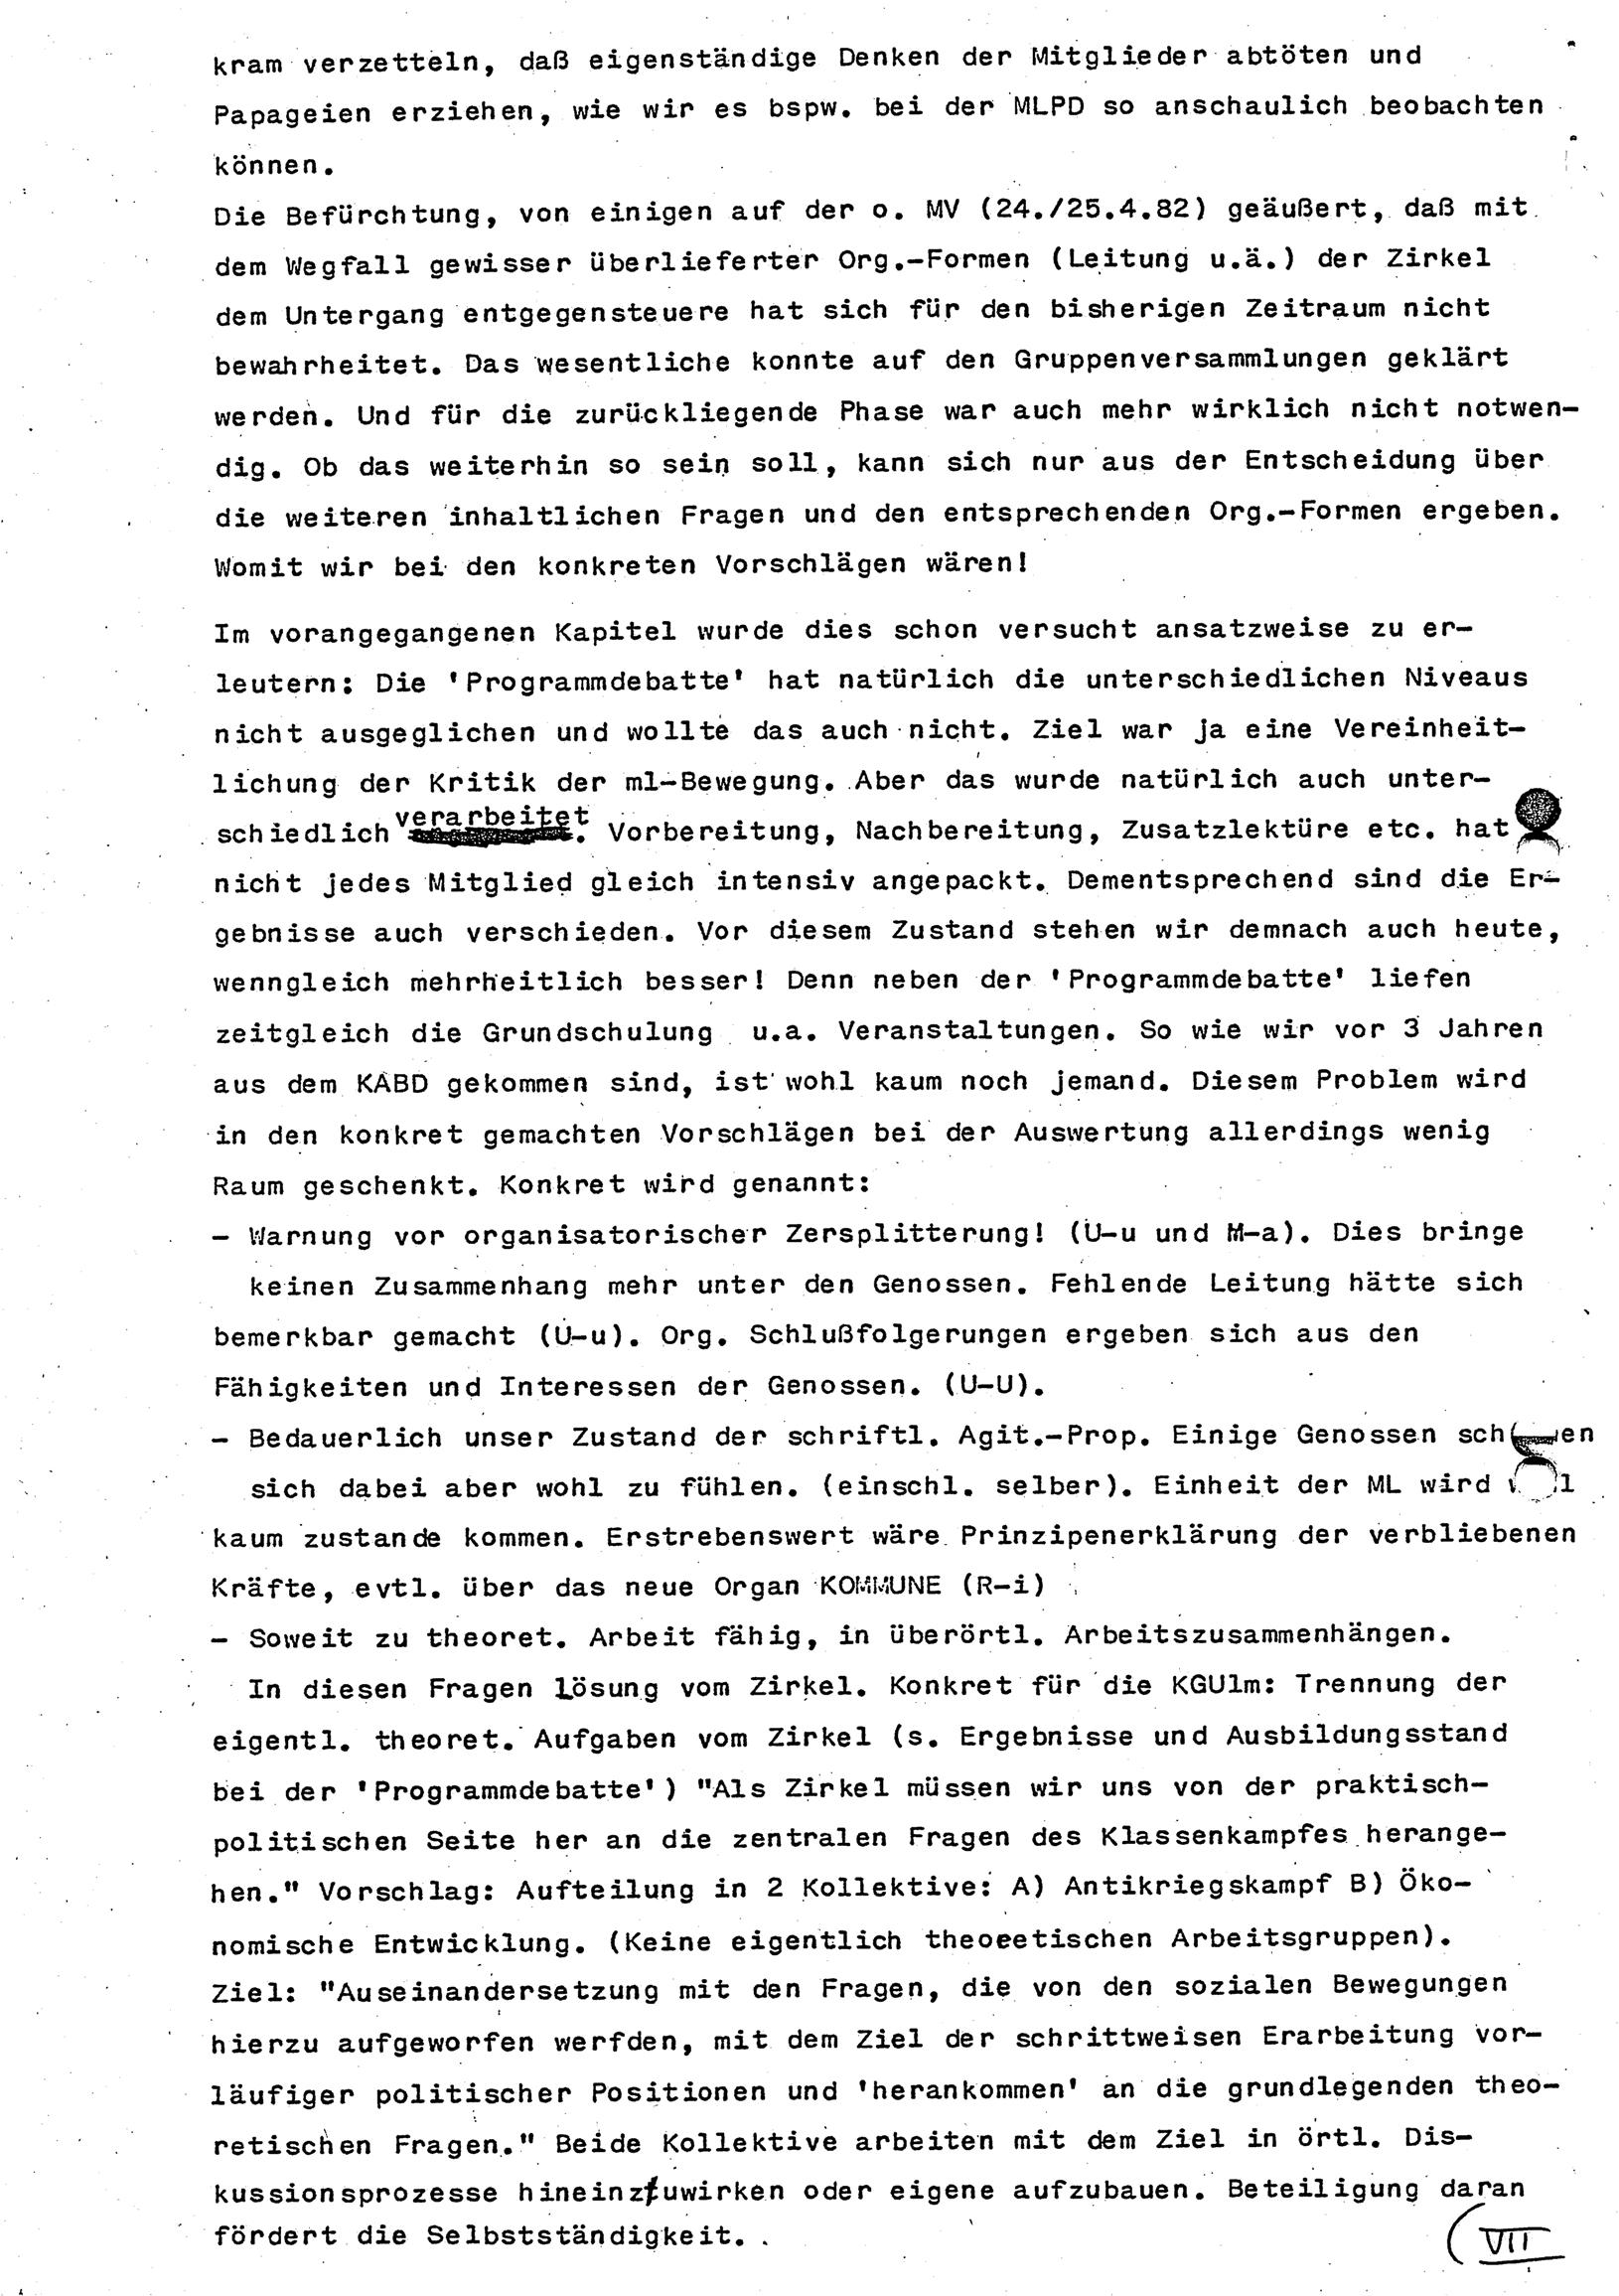 Ulm_KGU_Arbeitsheft_19830425_015_068